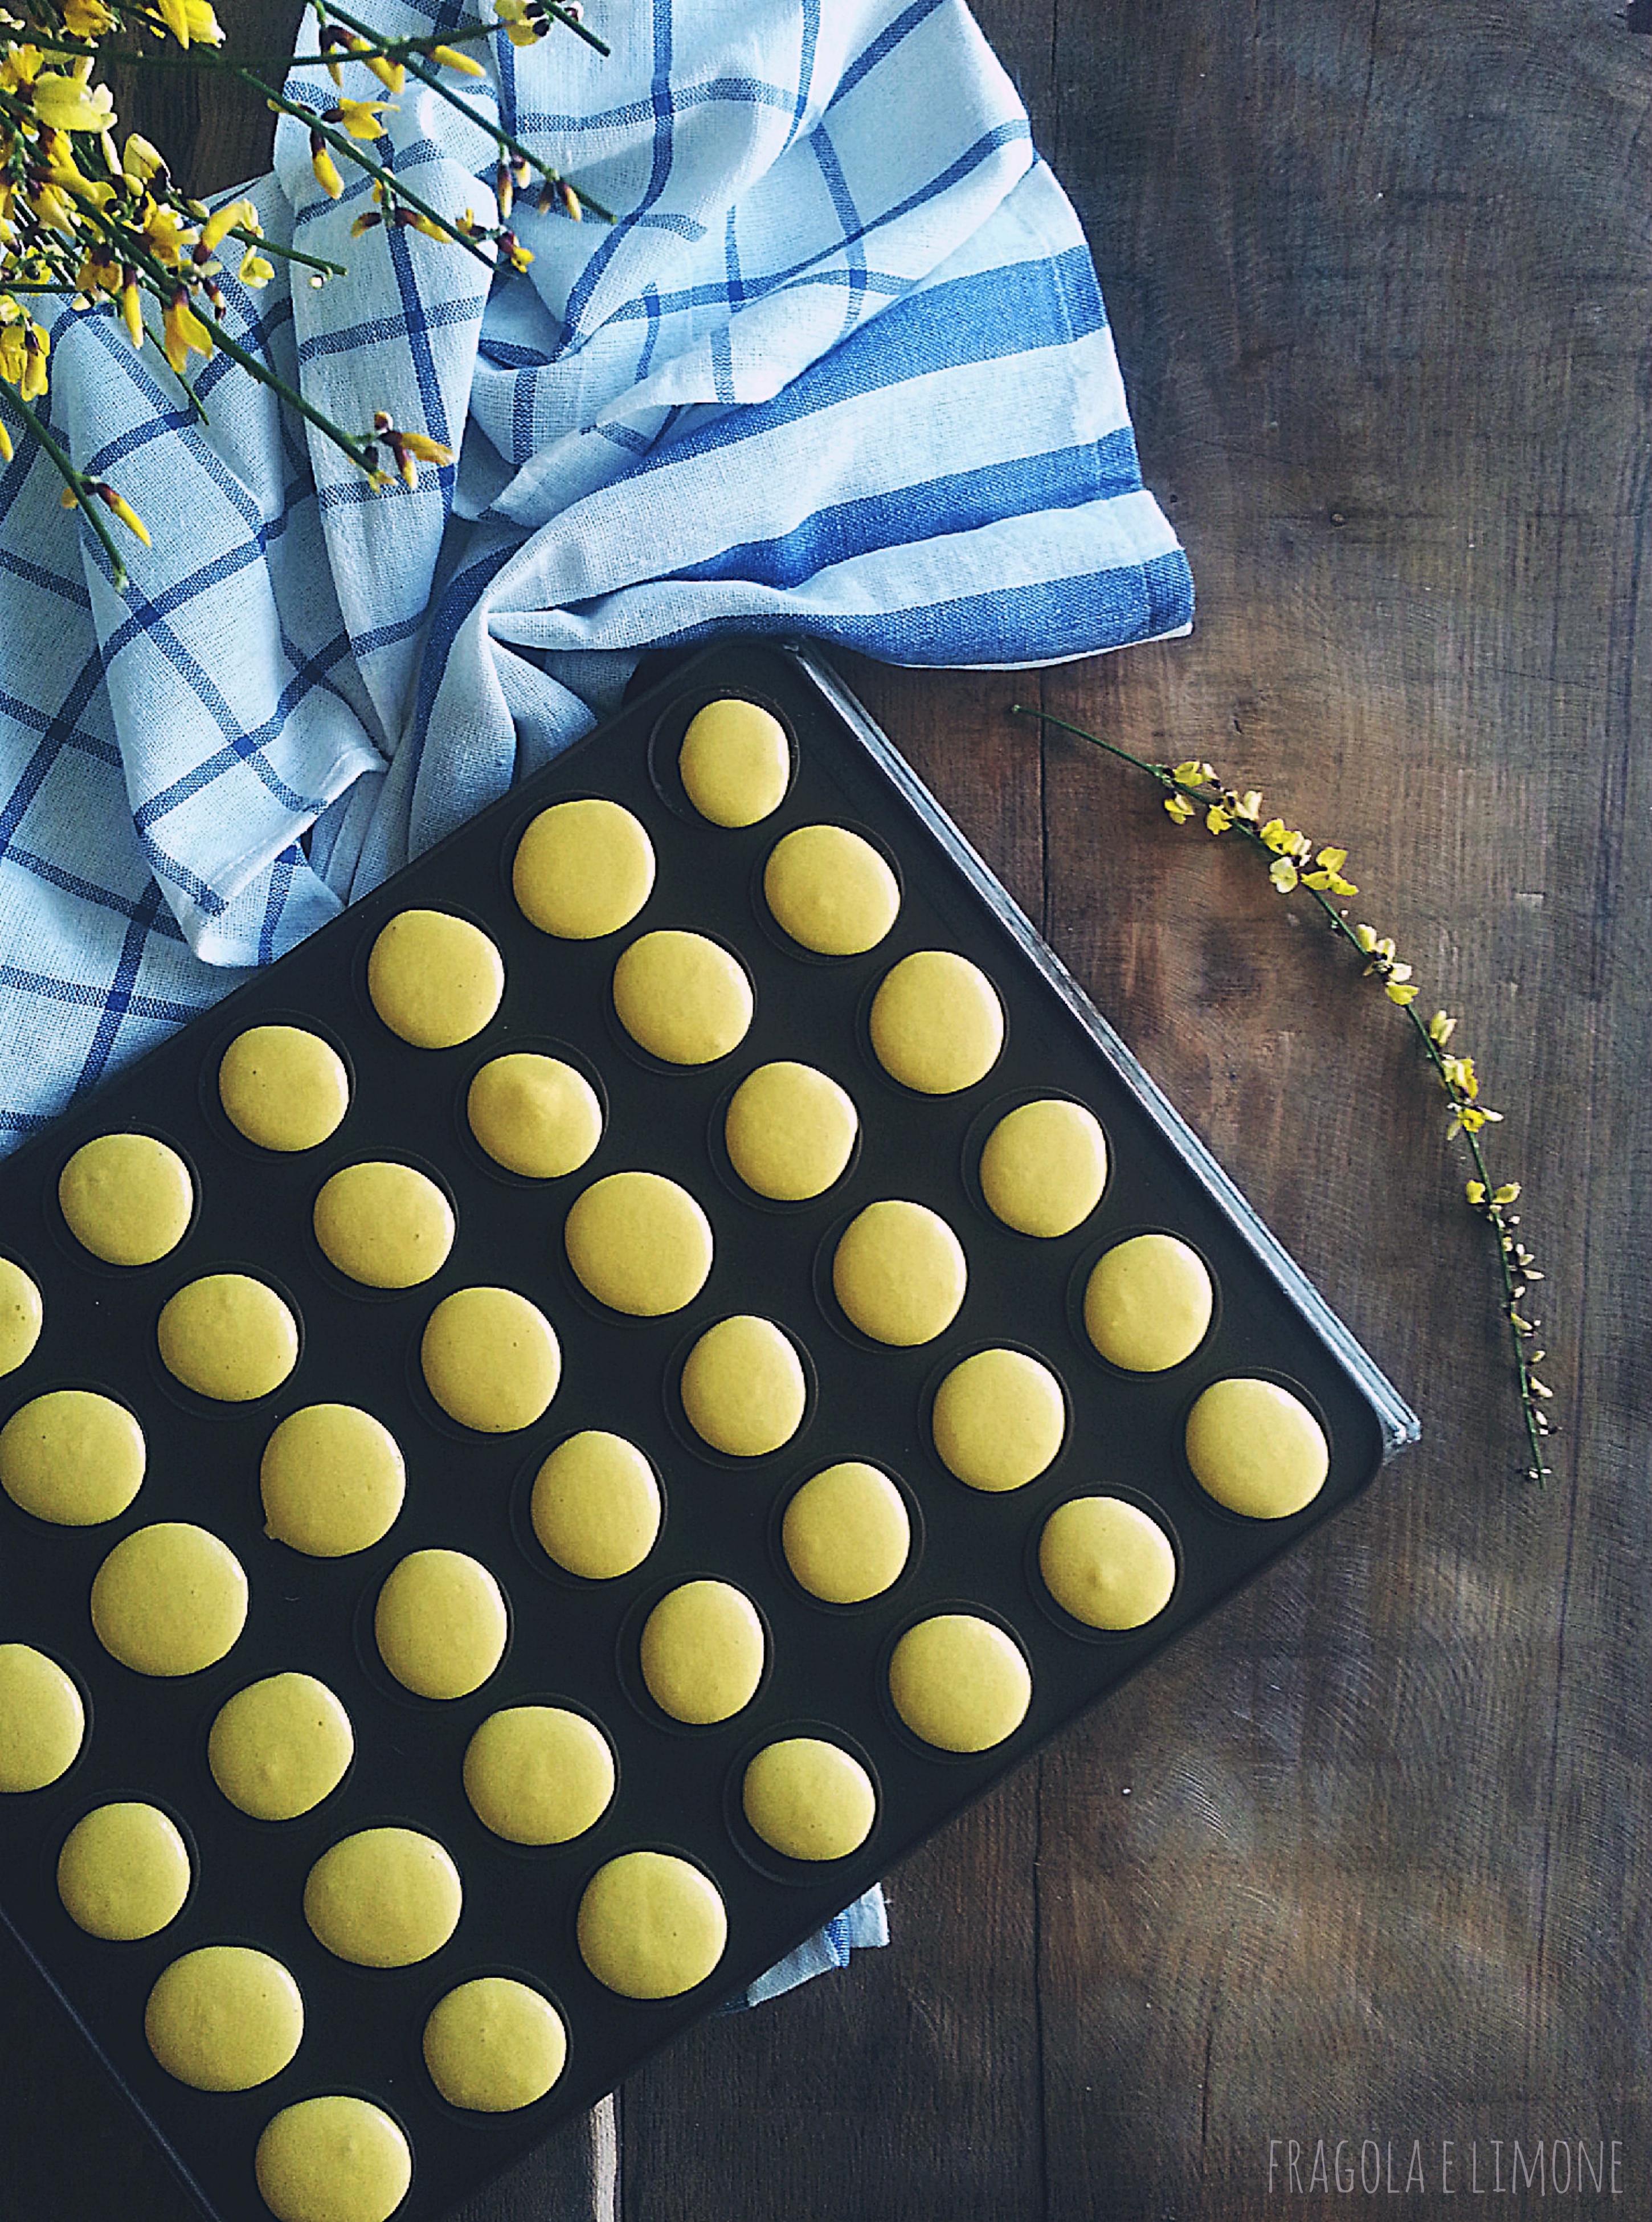 macaron al limone crudi